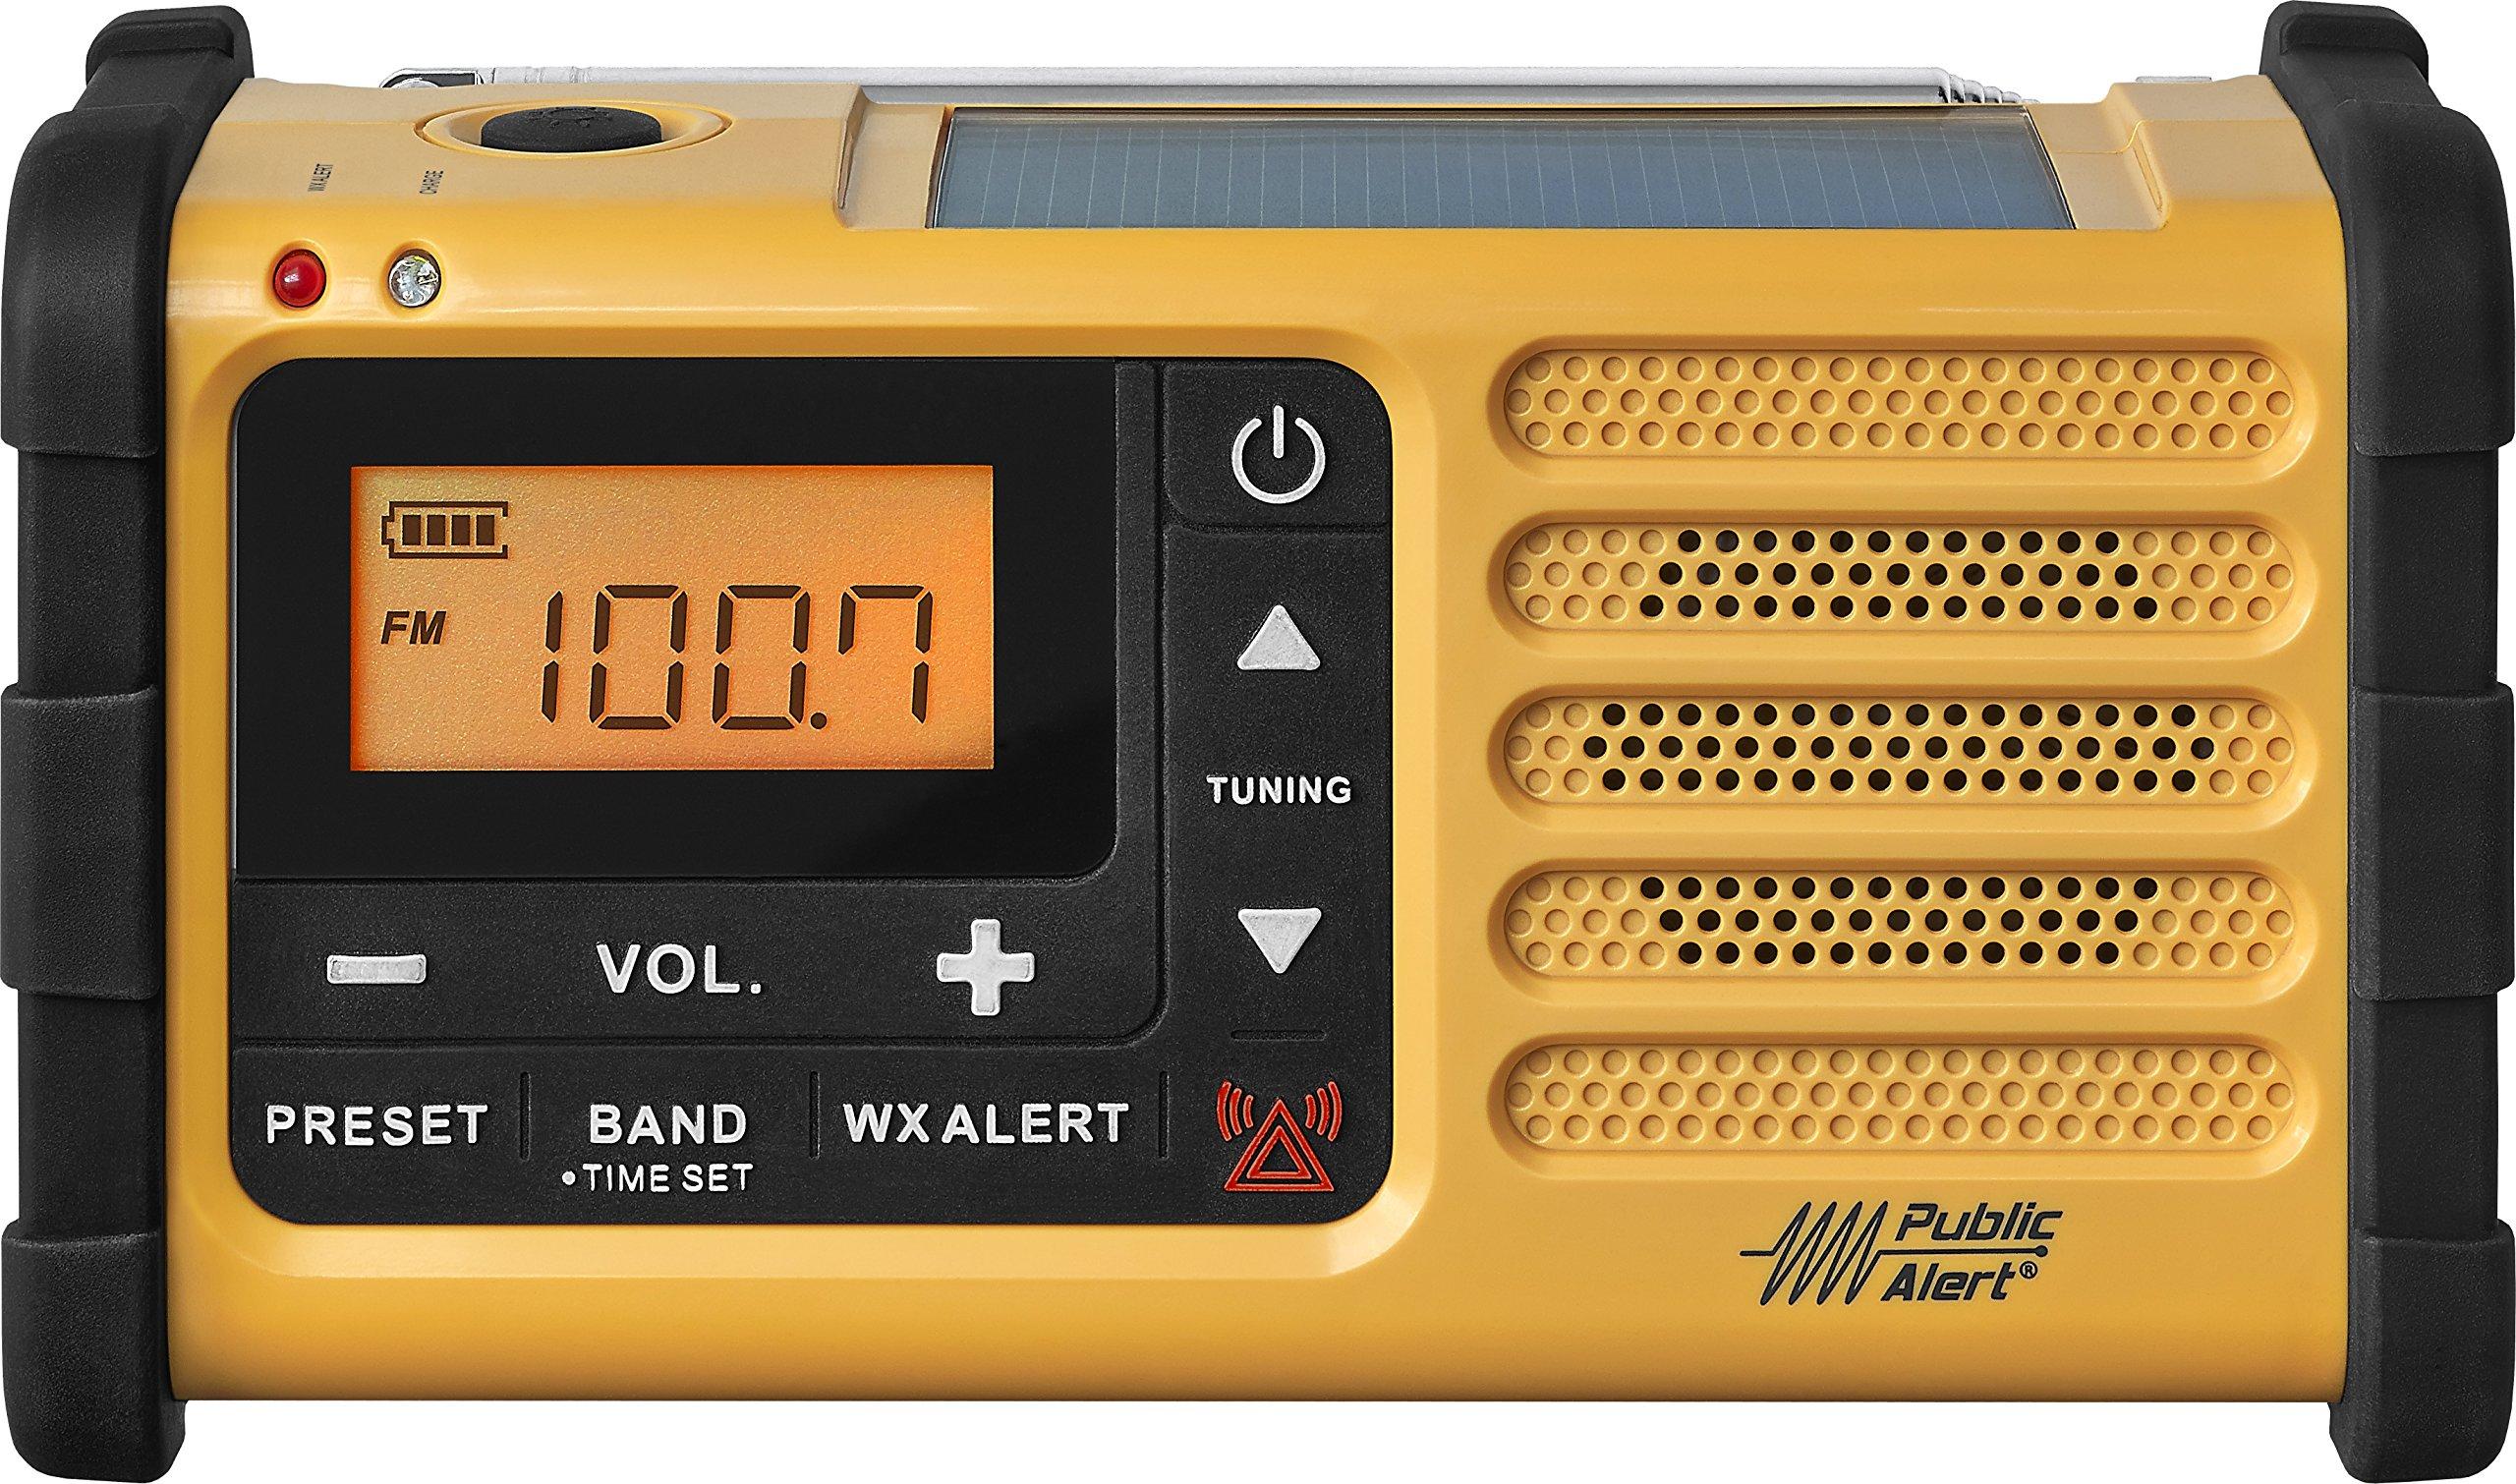 Sangean MMR 88 Emergency Flashlight Smartphone